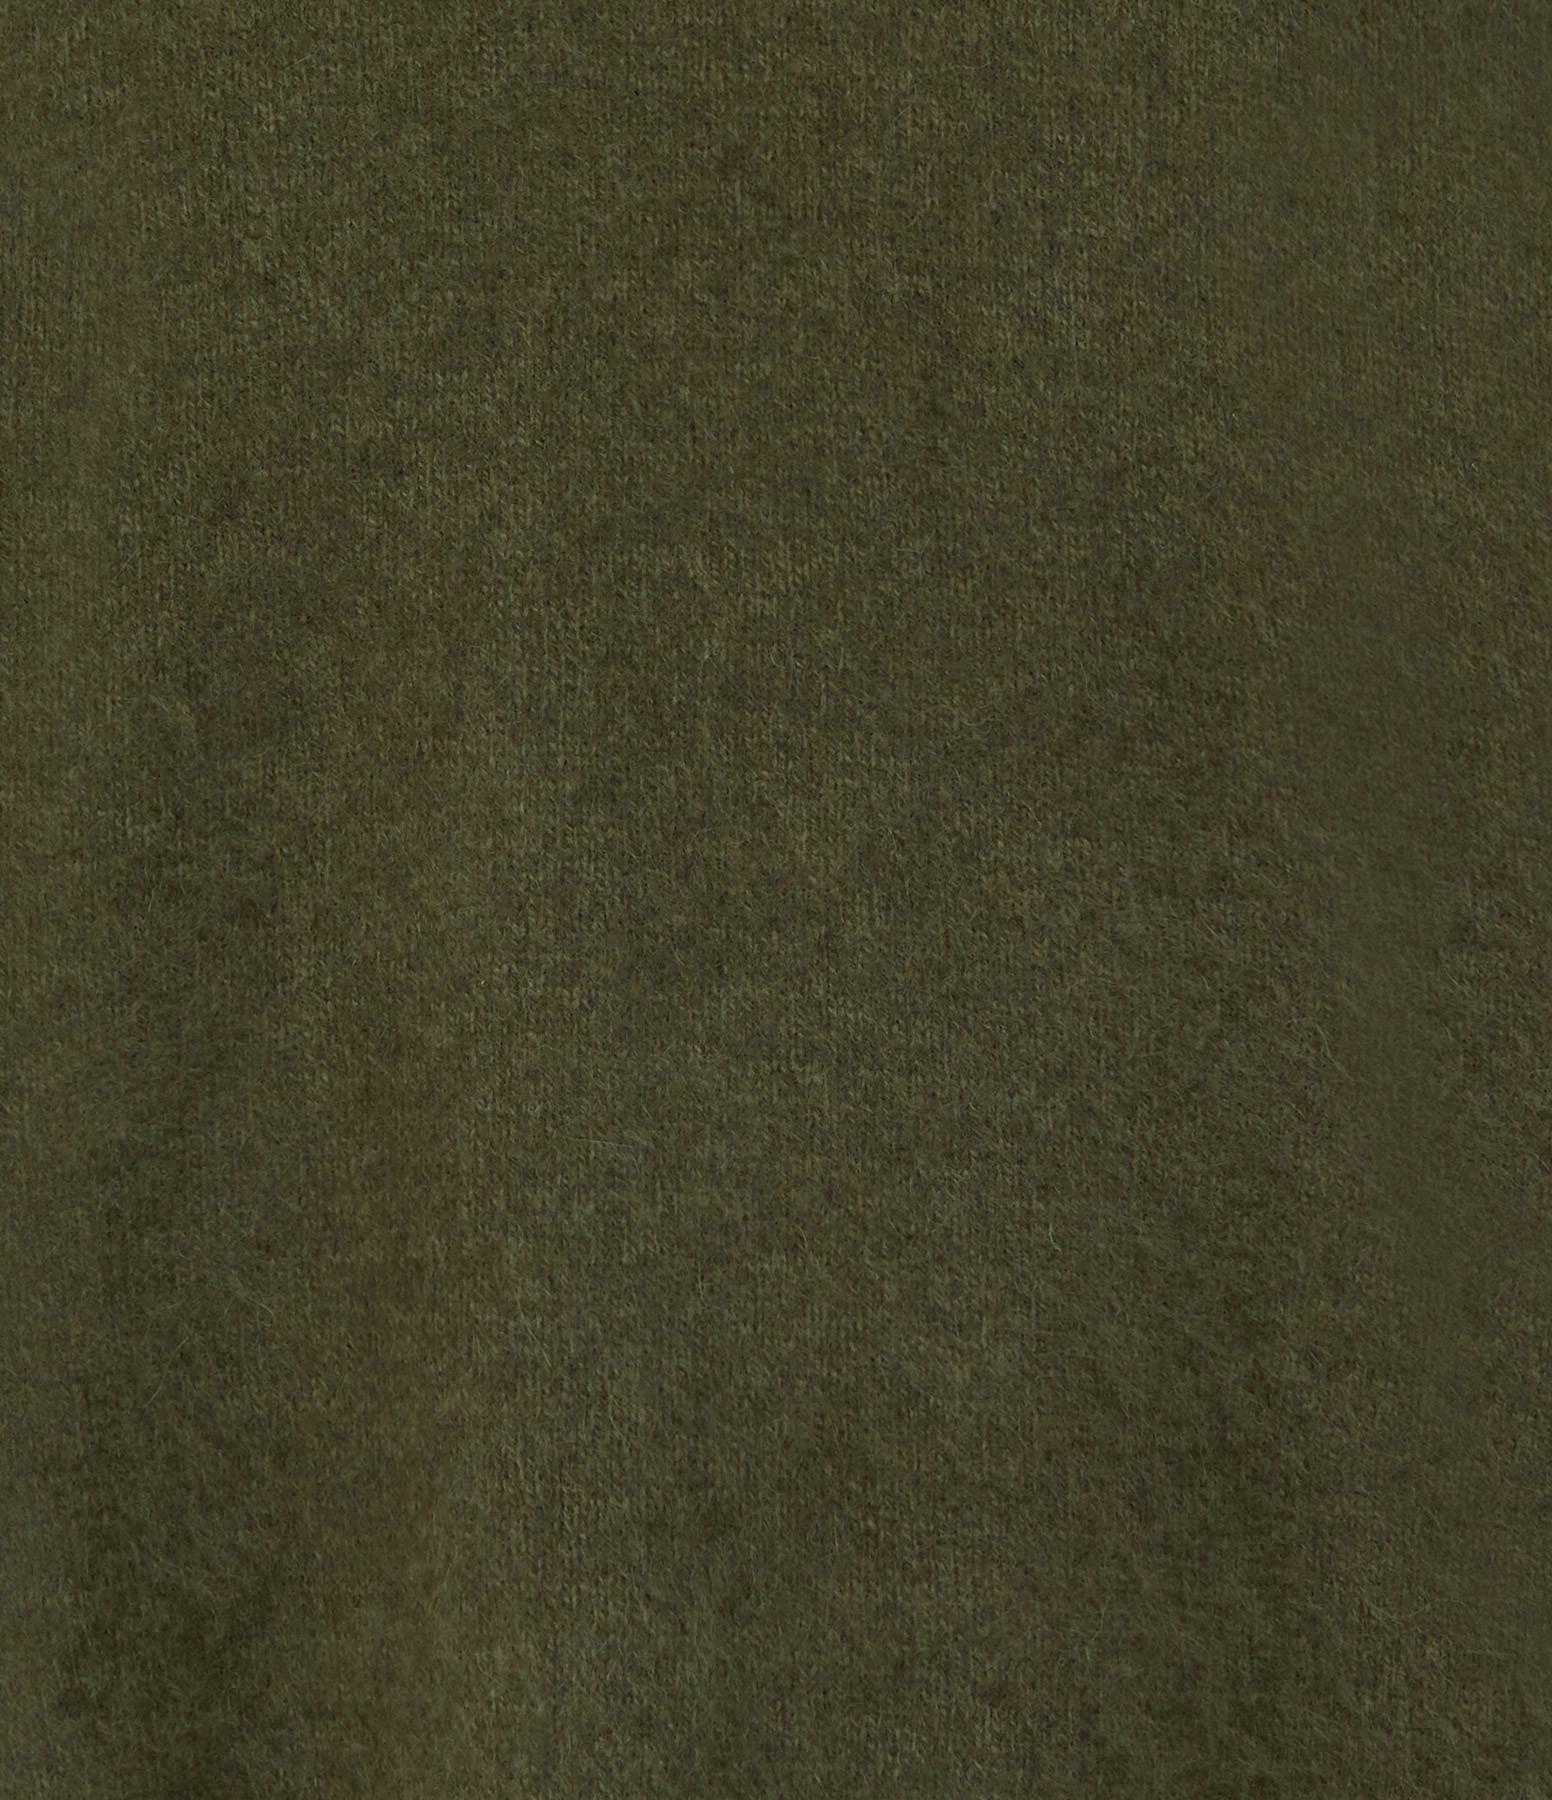 CT PLAGE - Pull Court Raccoon Vert Olive